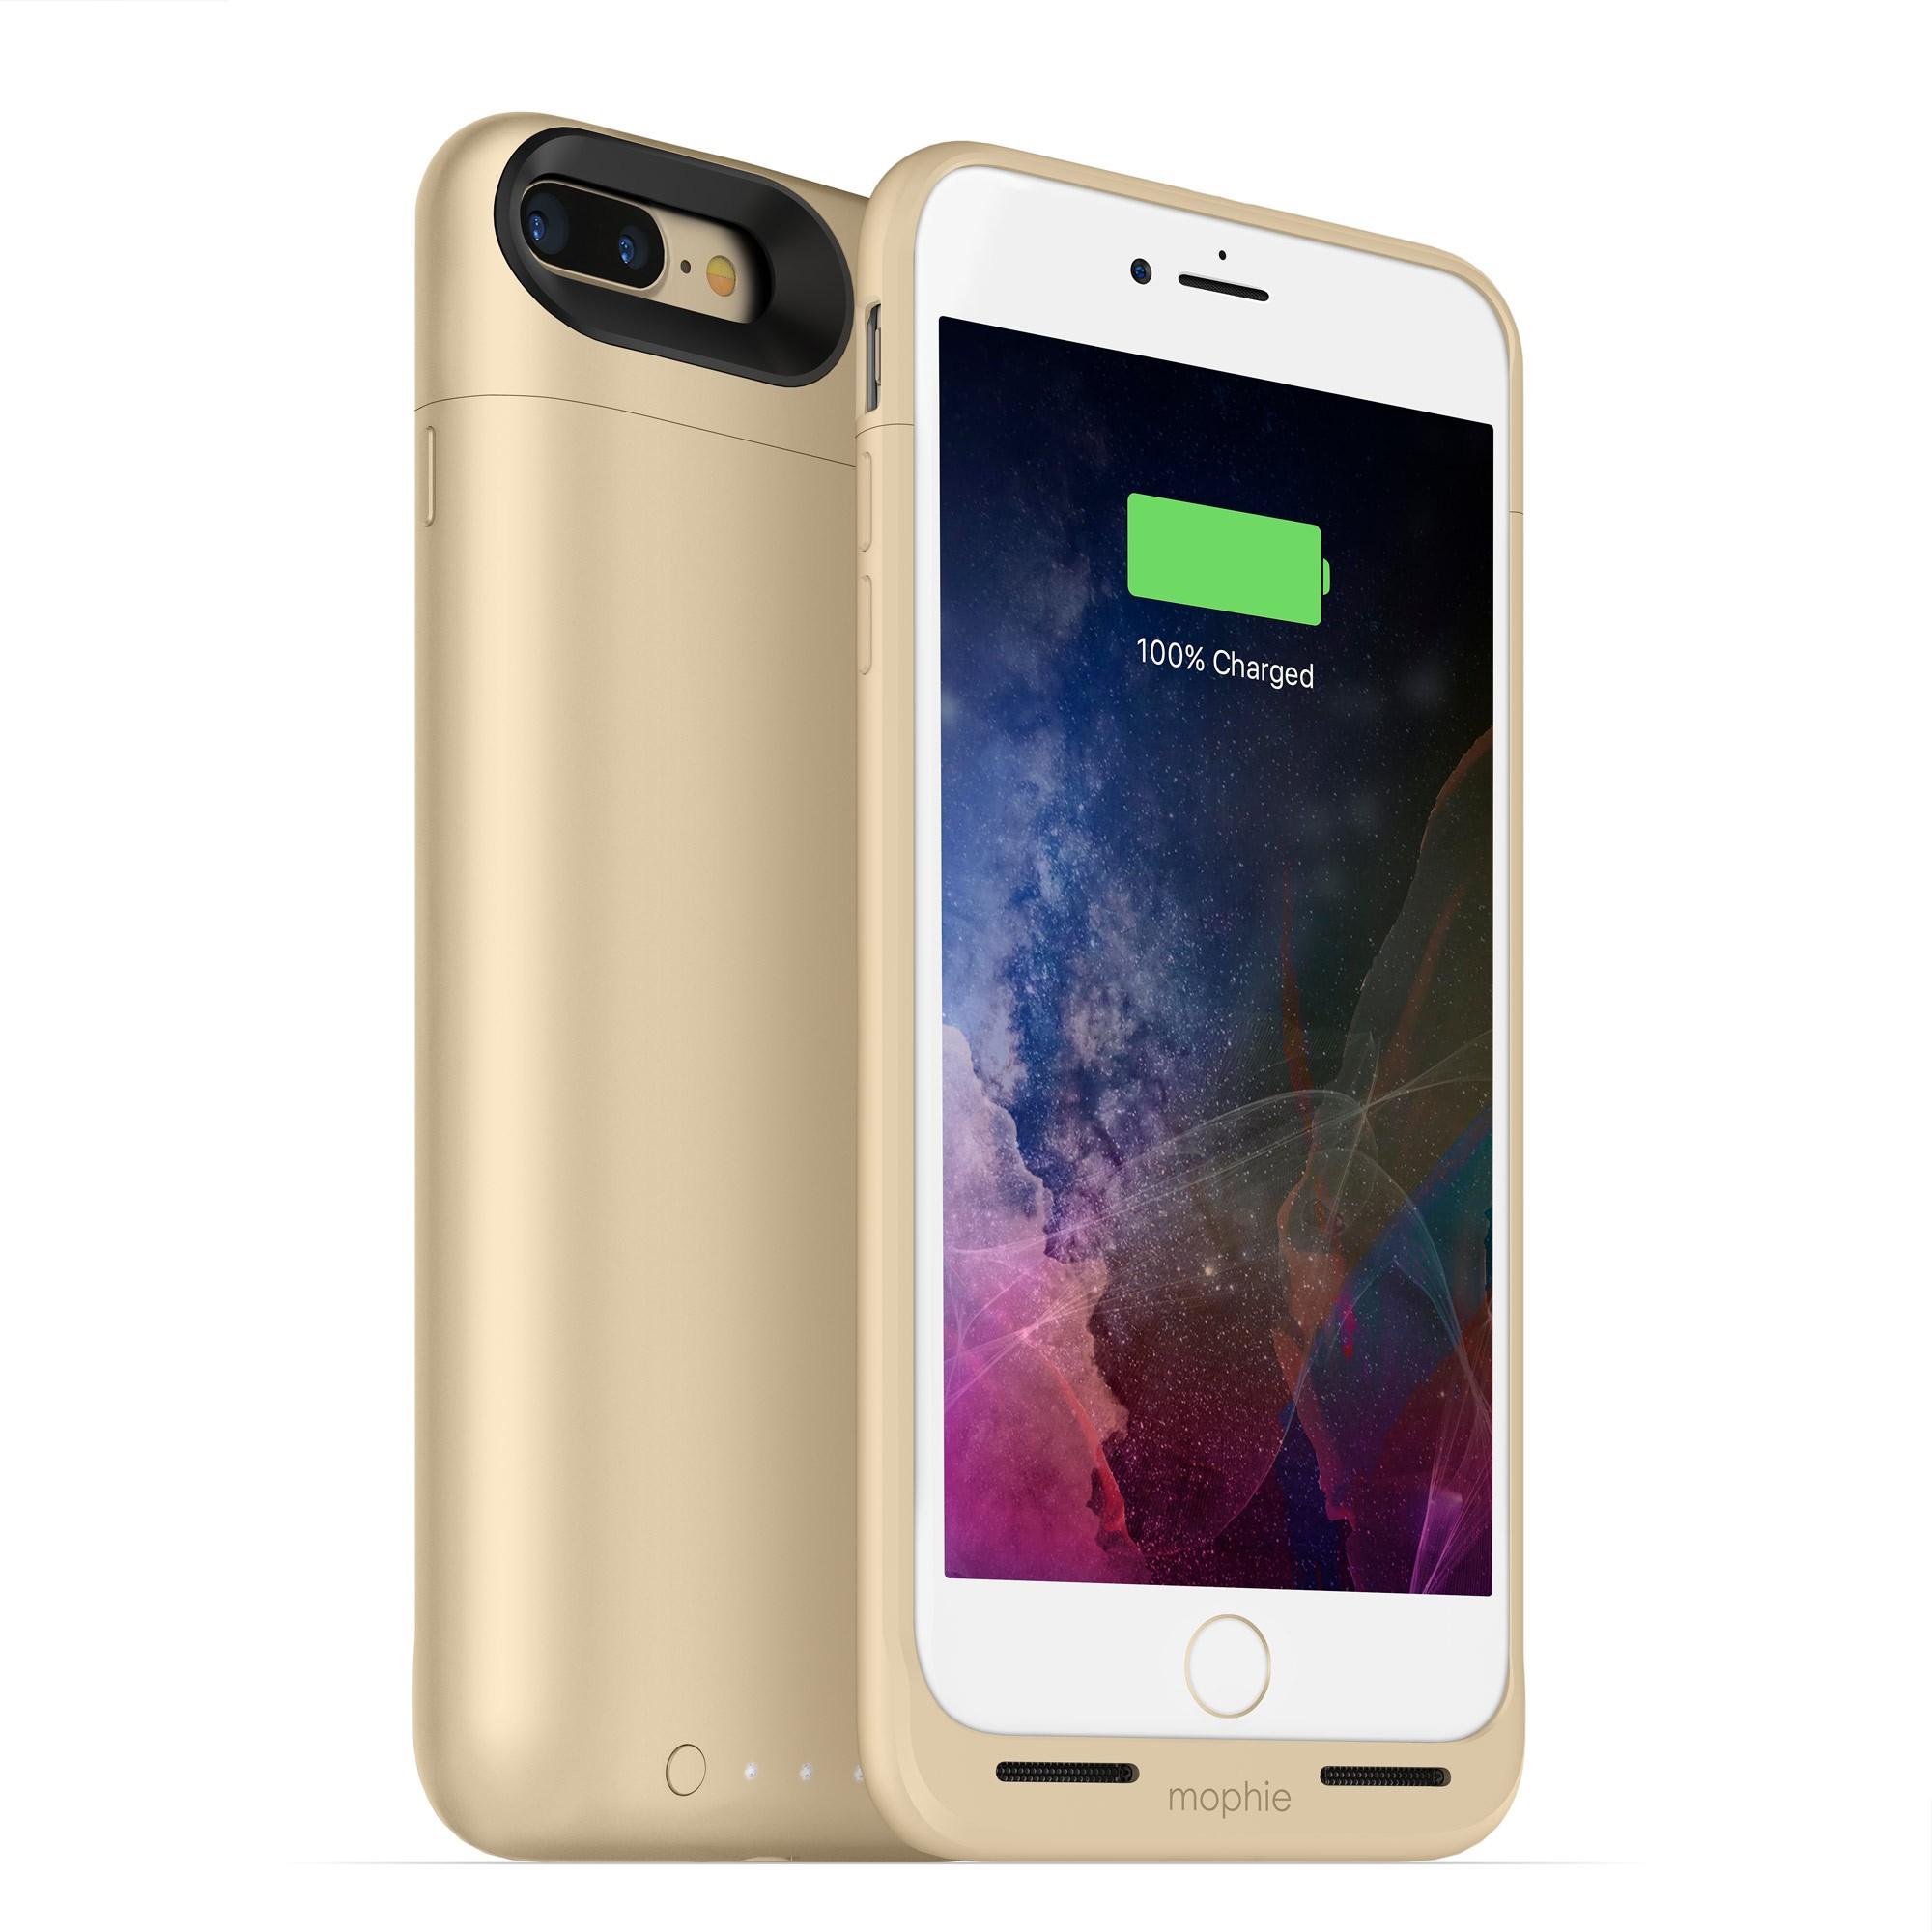 Nabíjecí pouzdro pro Apple iPhone 7 PLUS - Mophie, Juice Pack Air 2420mAh Gold